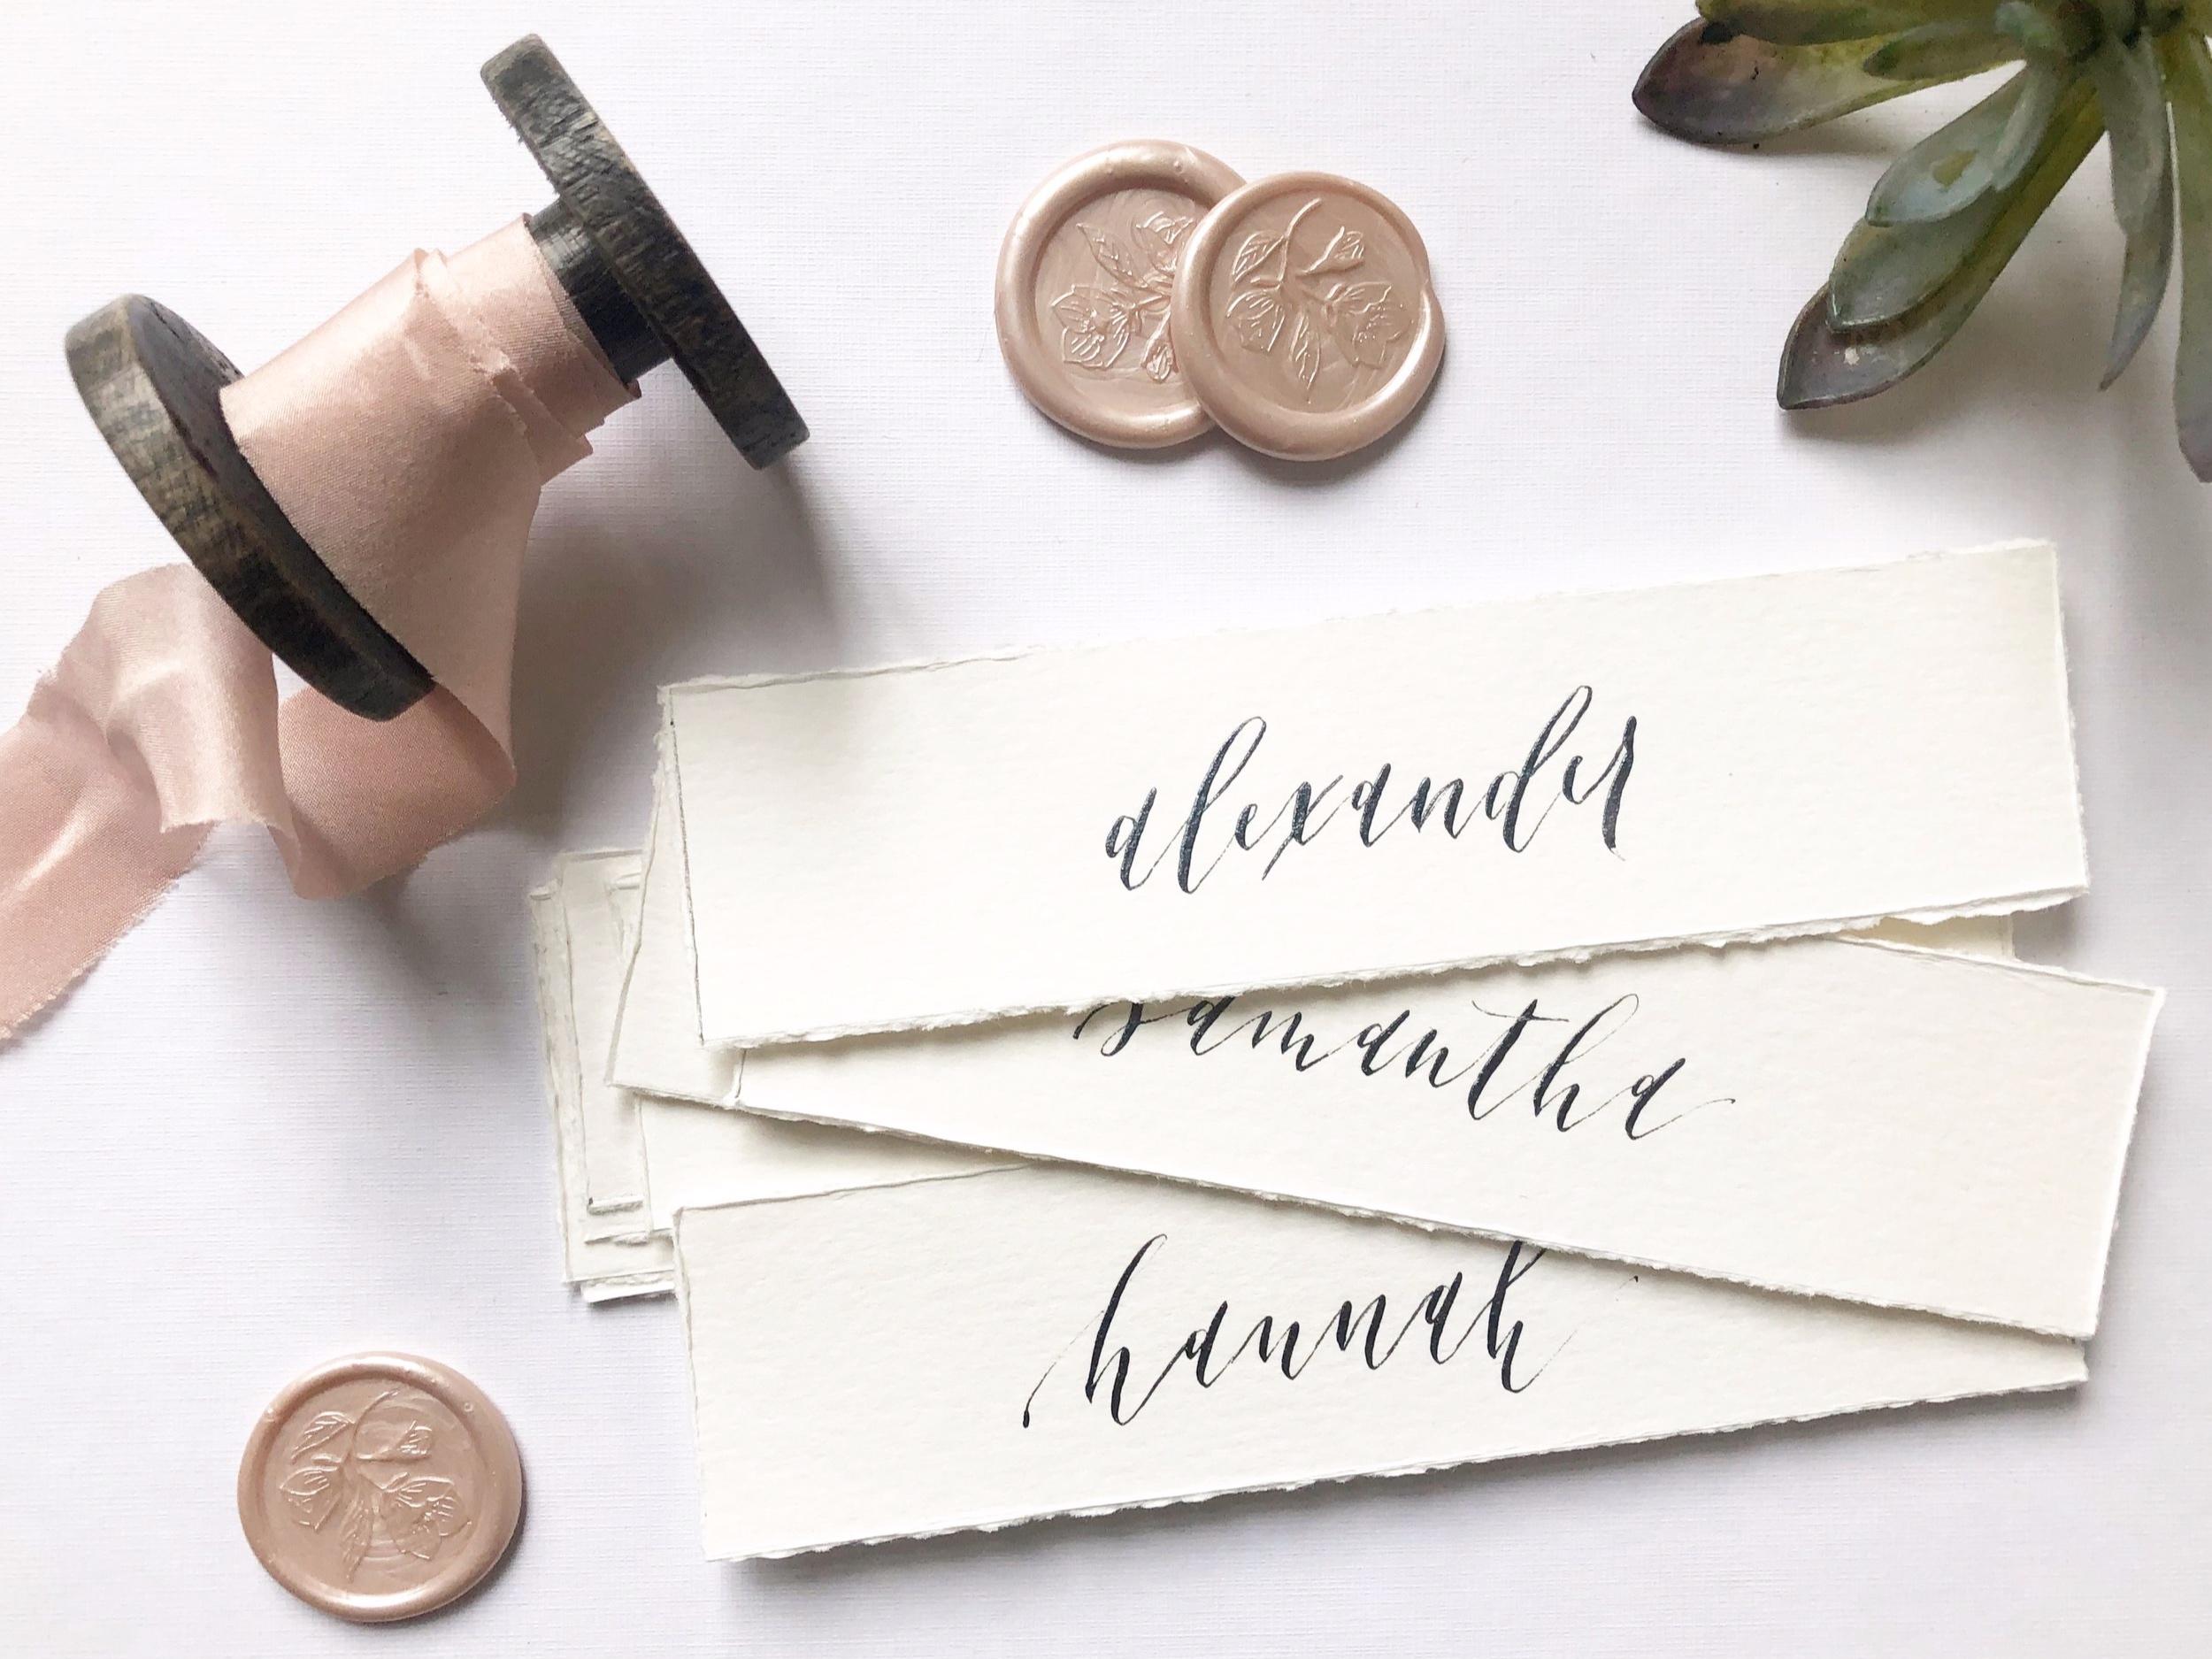 SERVICES - Chalkboard & Mirror SignsEnvelope AddressingWedding Day DetailsDigital CalligraphyLaser Cut Signs